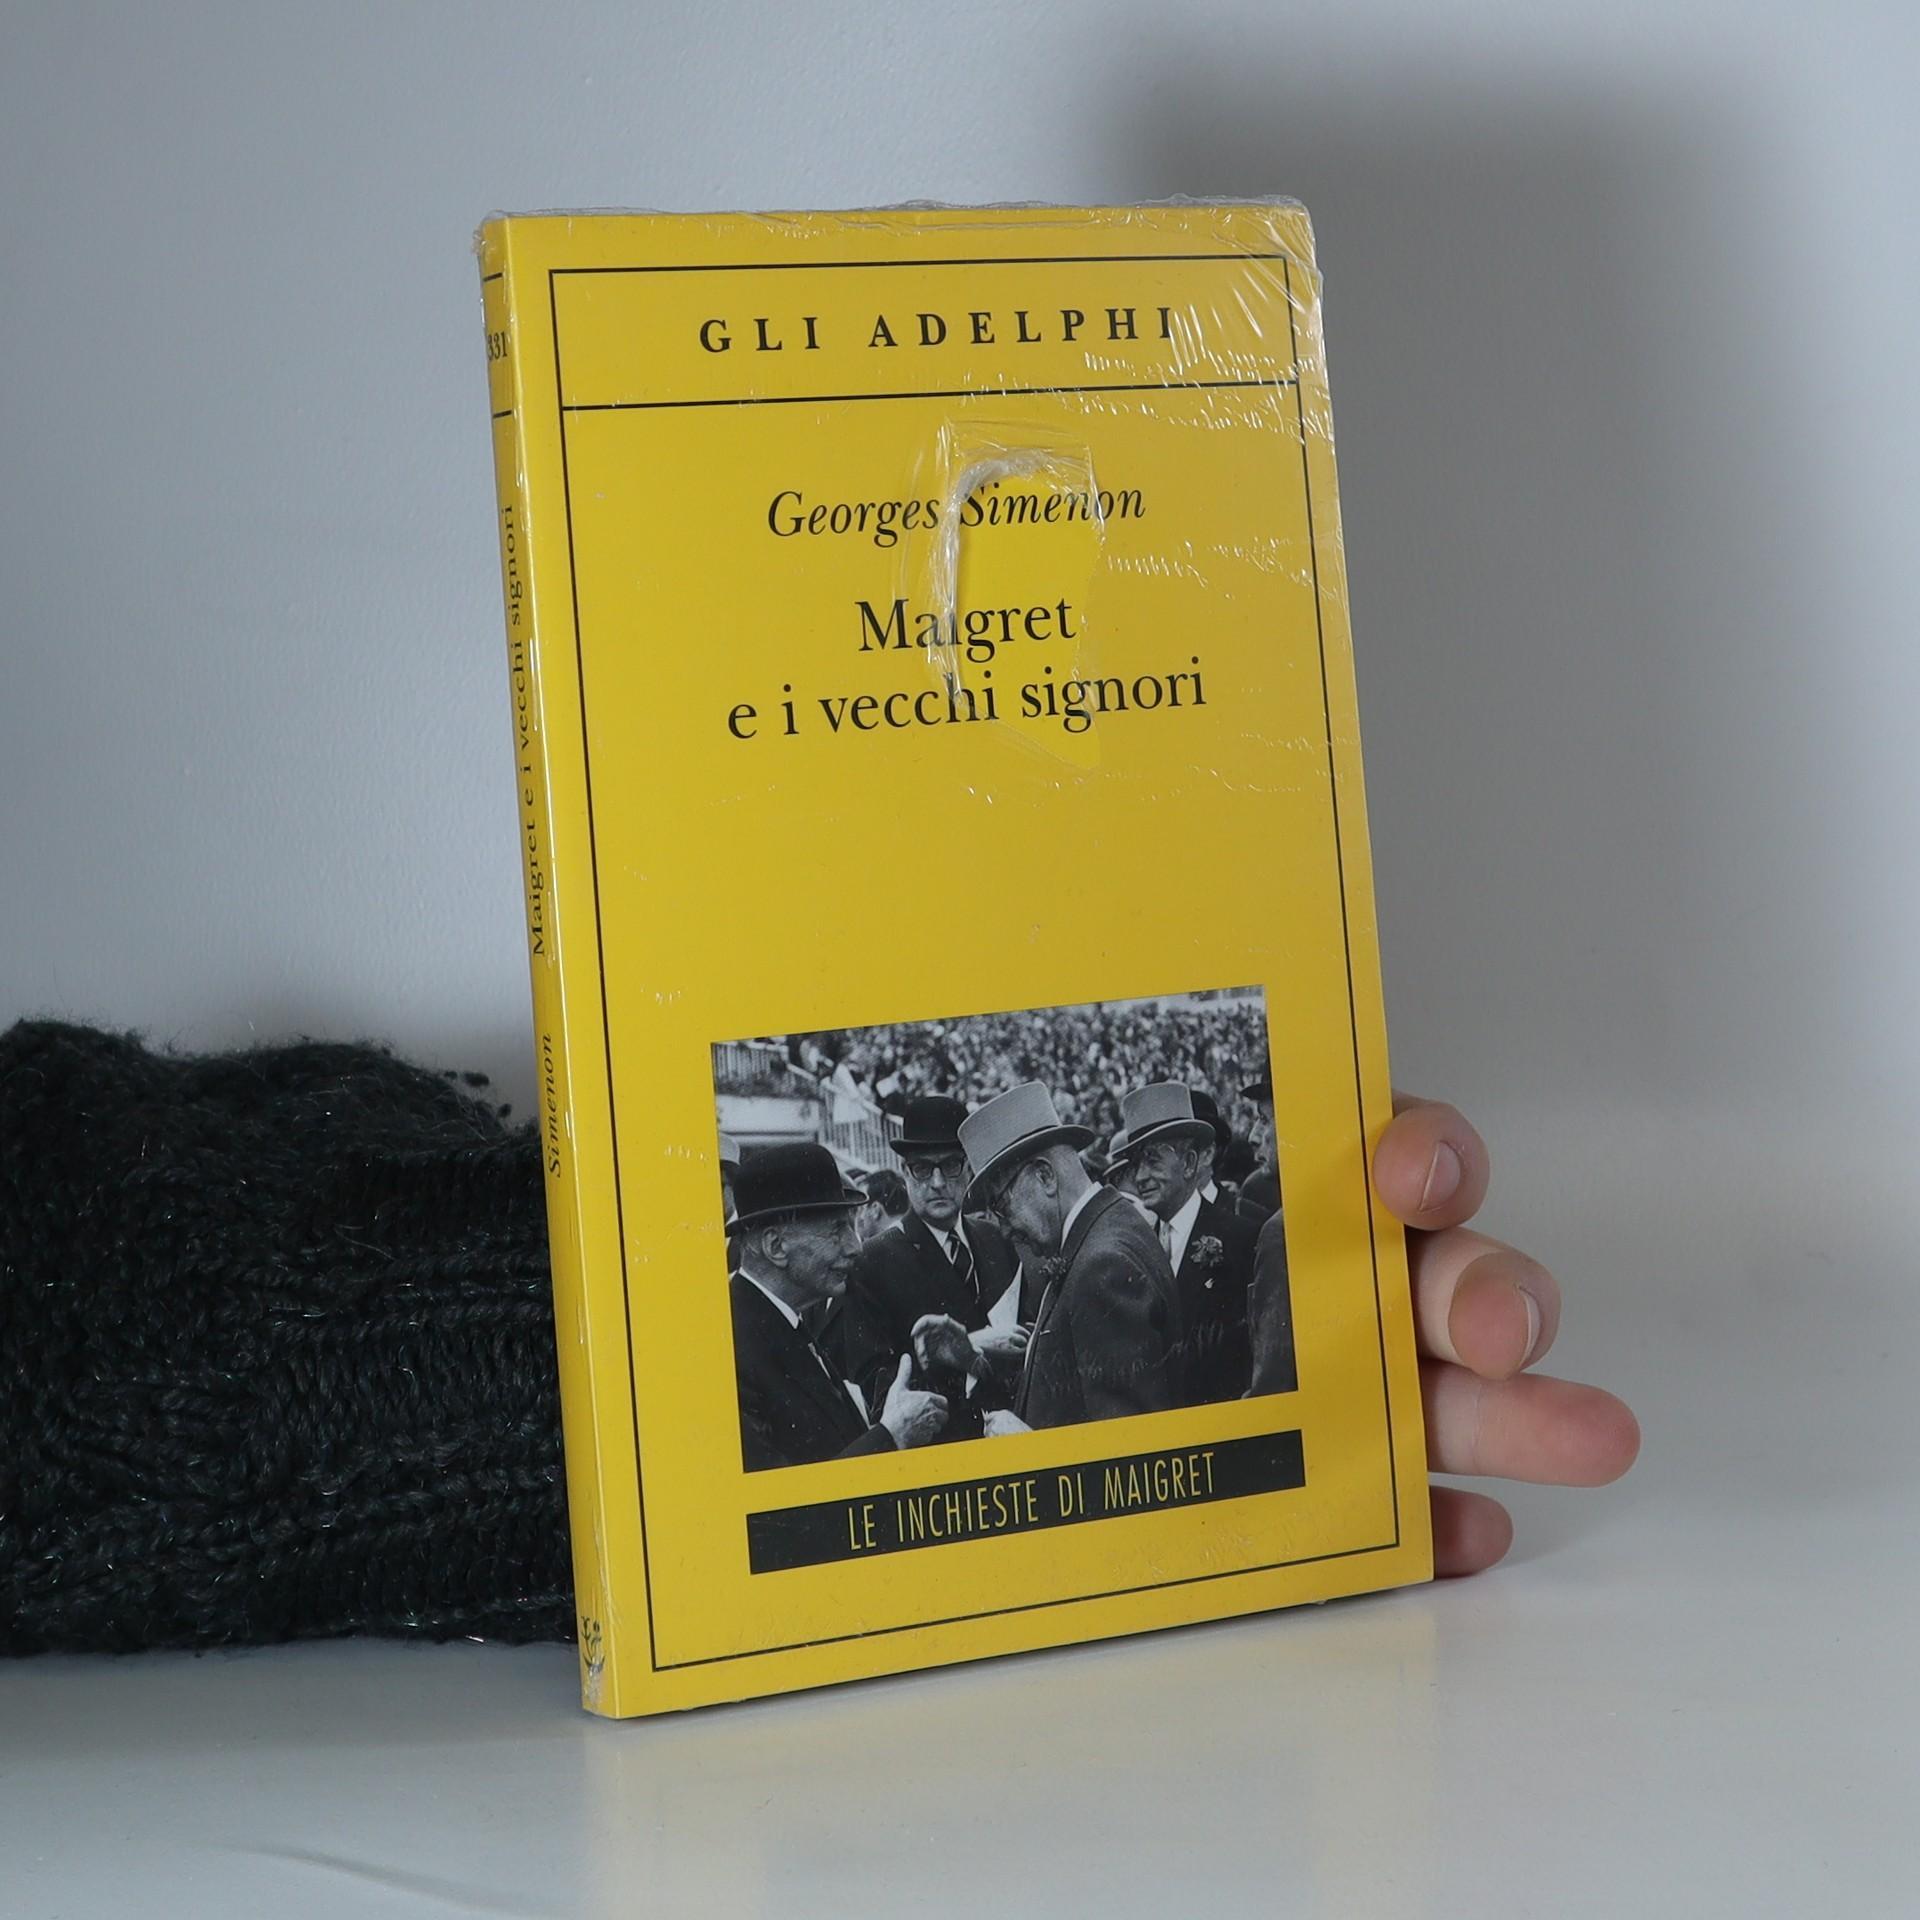 antikvární kniha Maigret e i vecchi signori, 2008